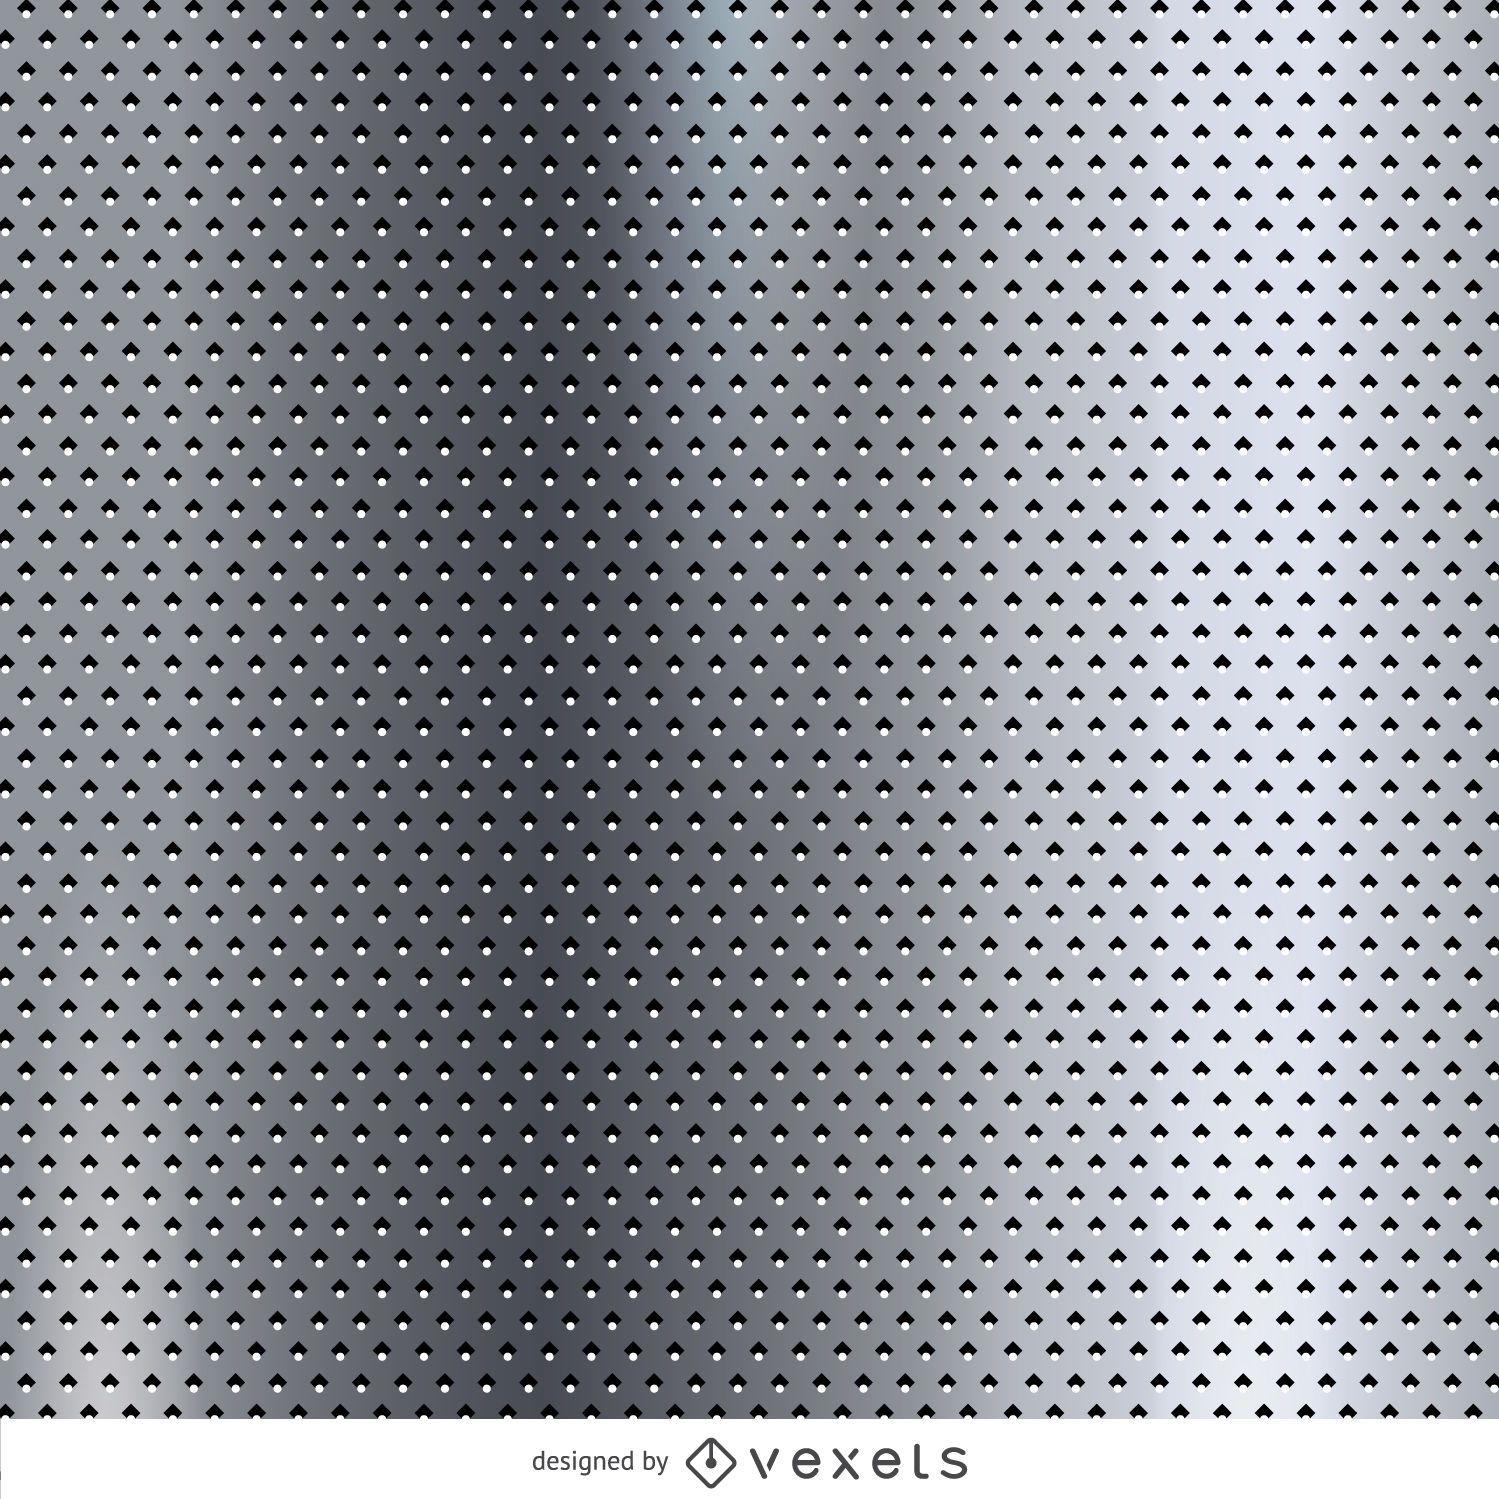 Textura metálica punteada